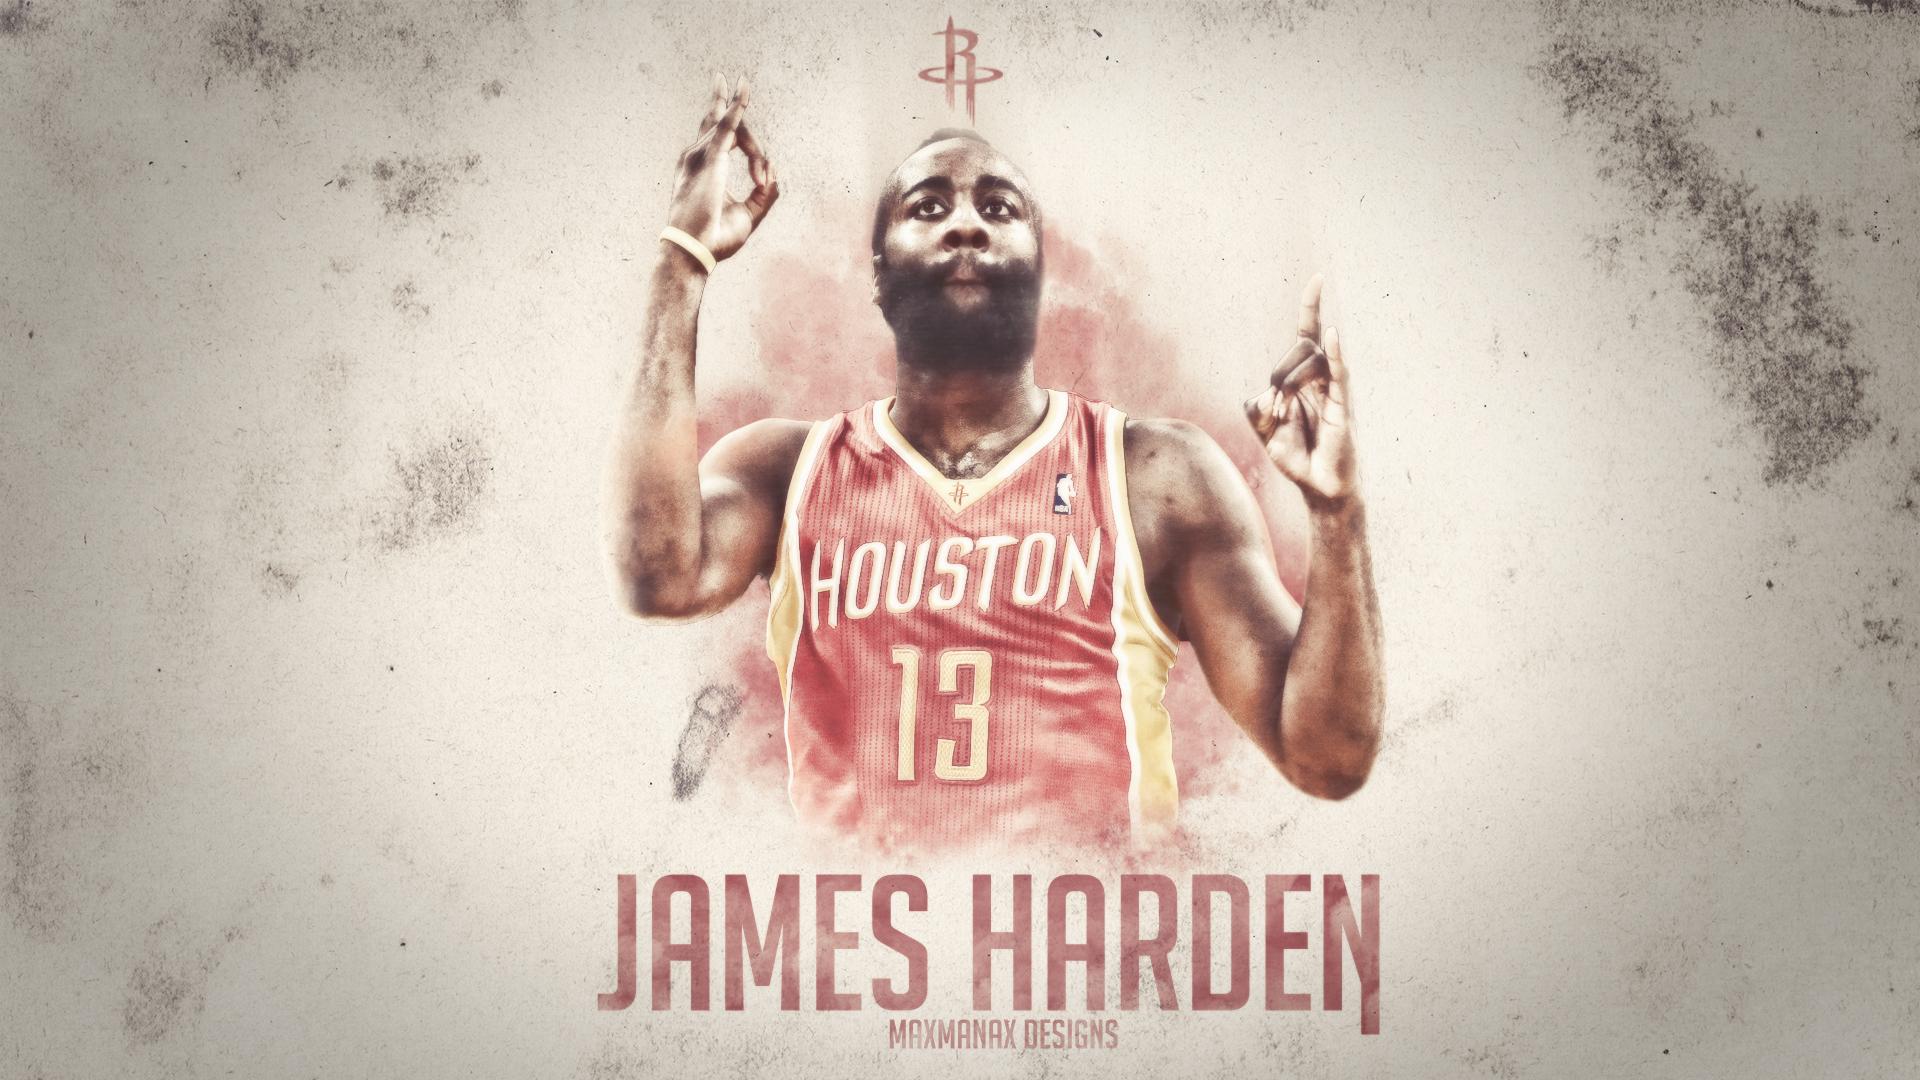 James Harden Hd Wallpaper Background Image 1920x1080 Id